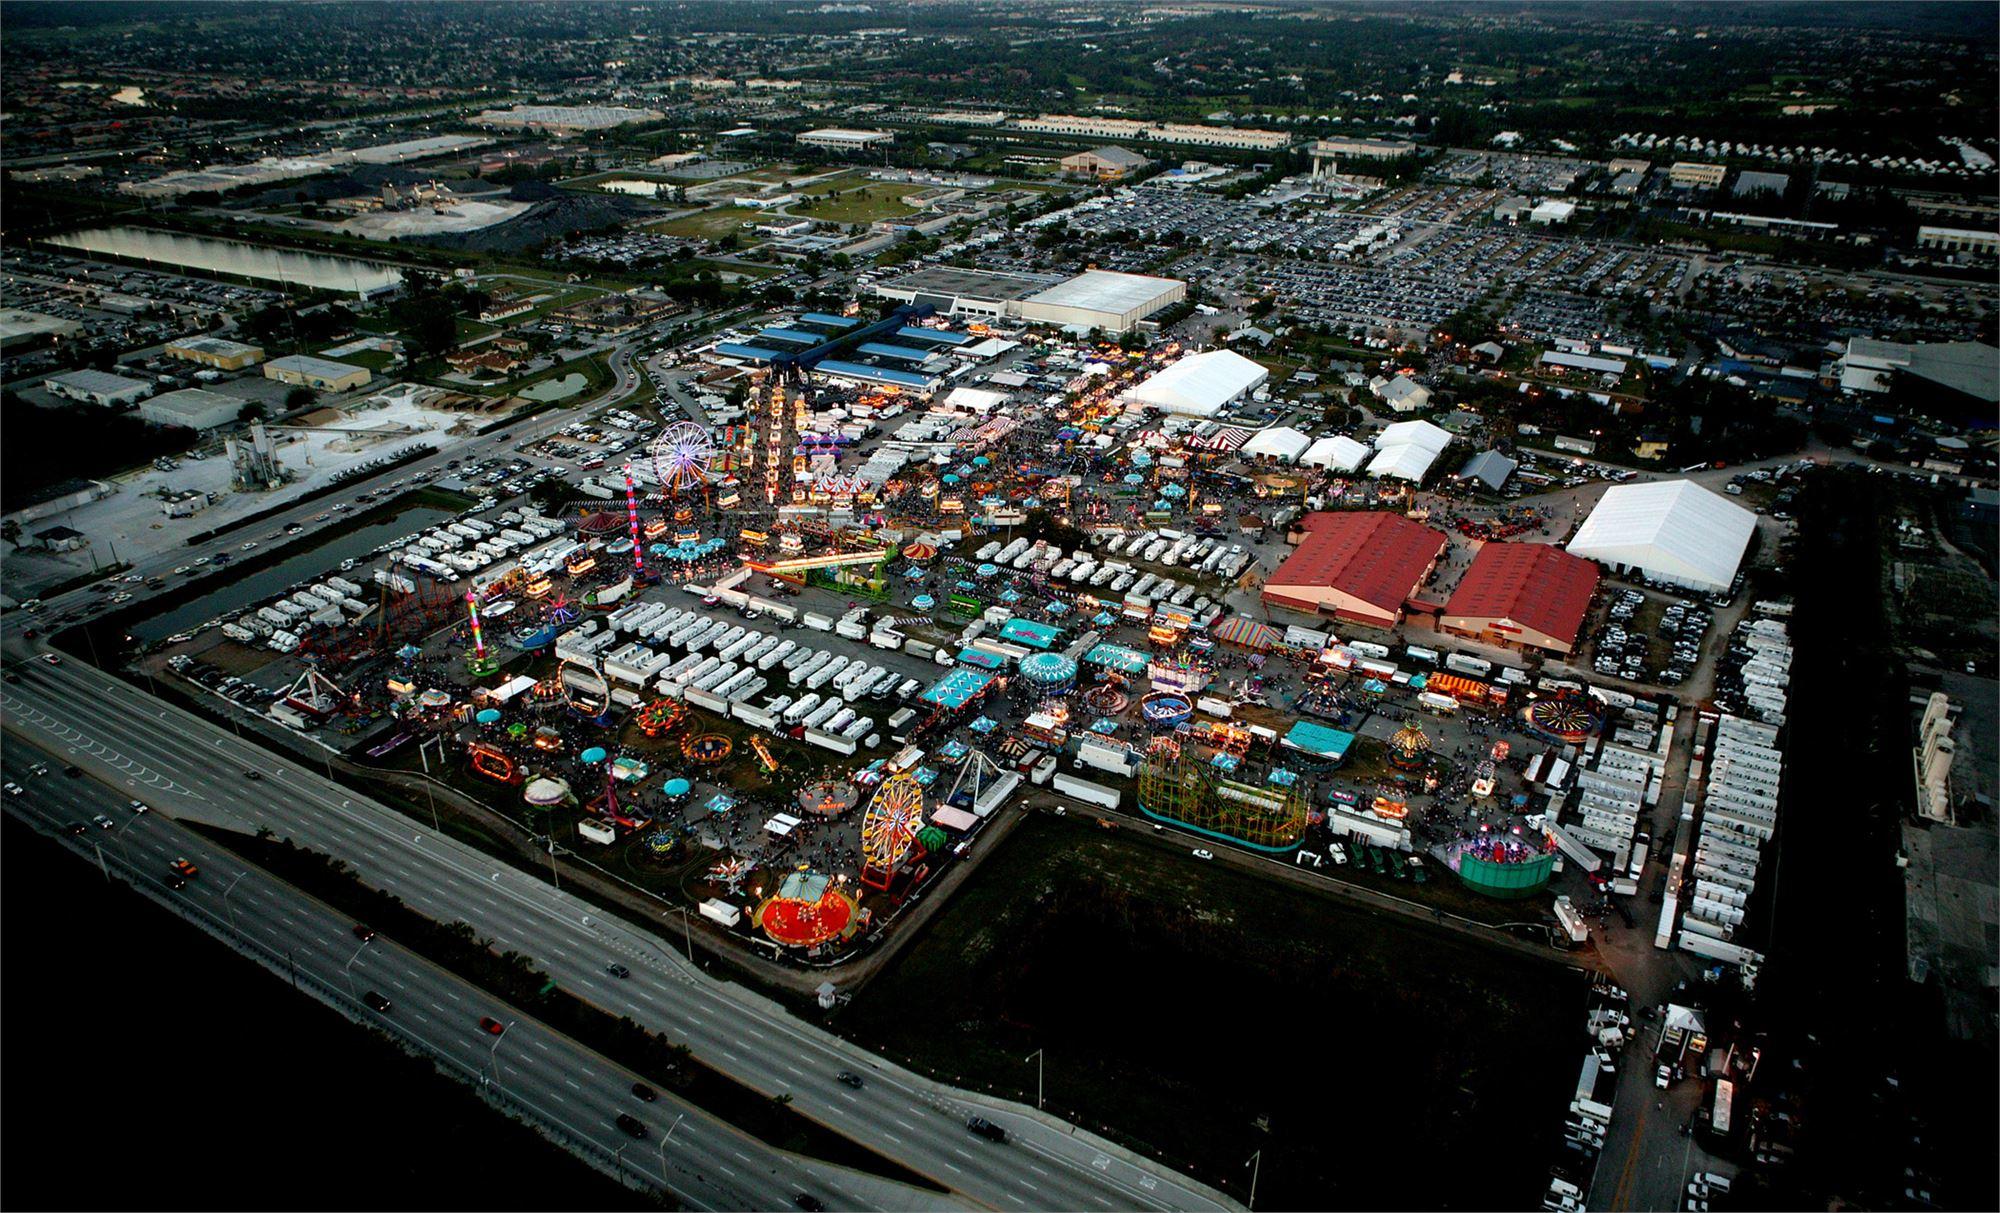 South Florida Fair | West Palm Beach, Fl | 561.793.0333 For South Florida Fairgrounds Event Schedule